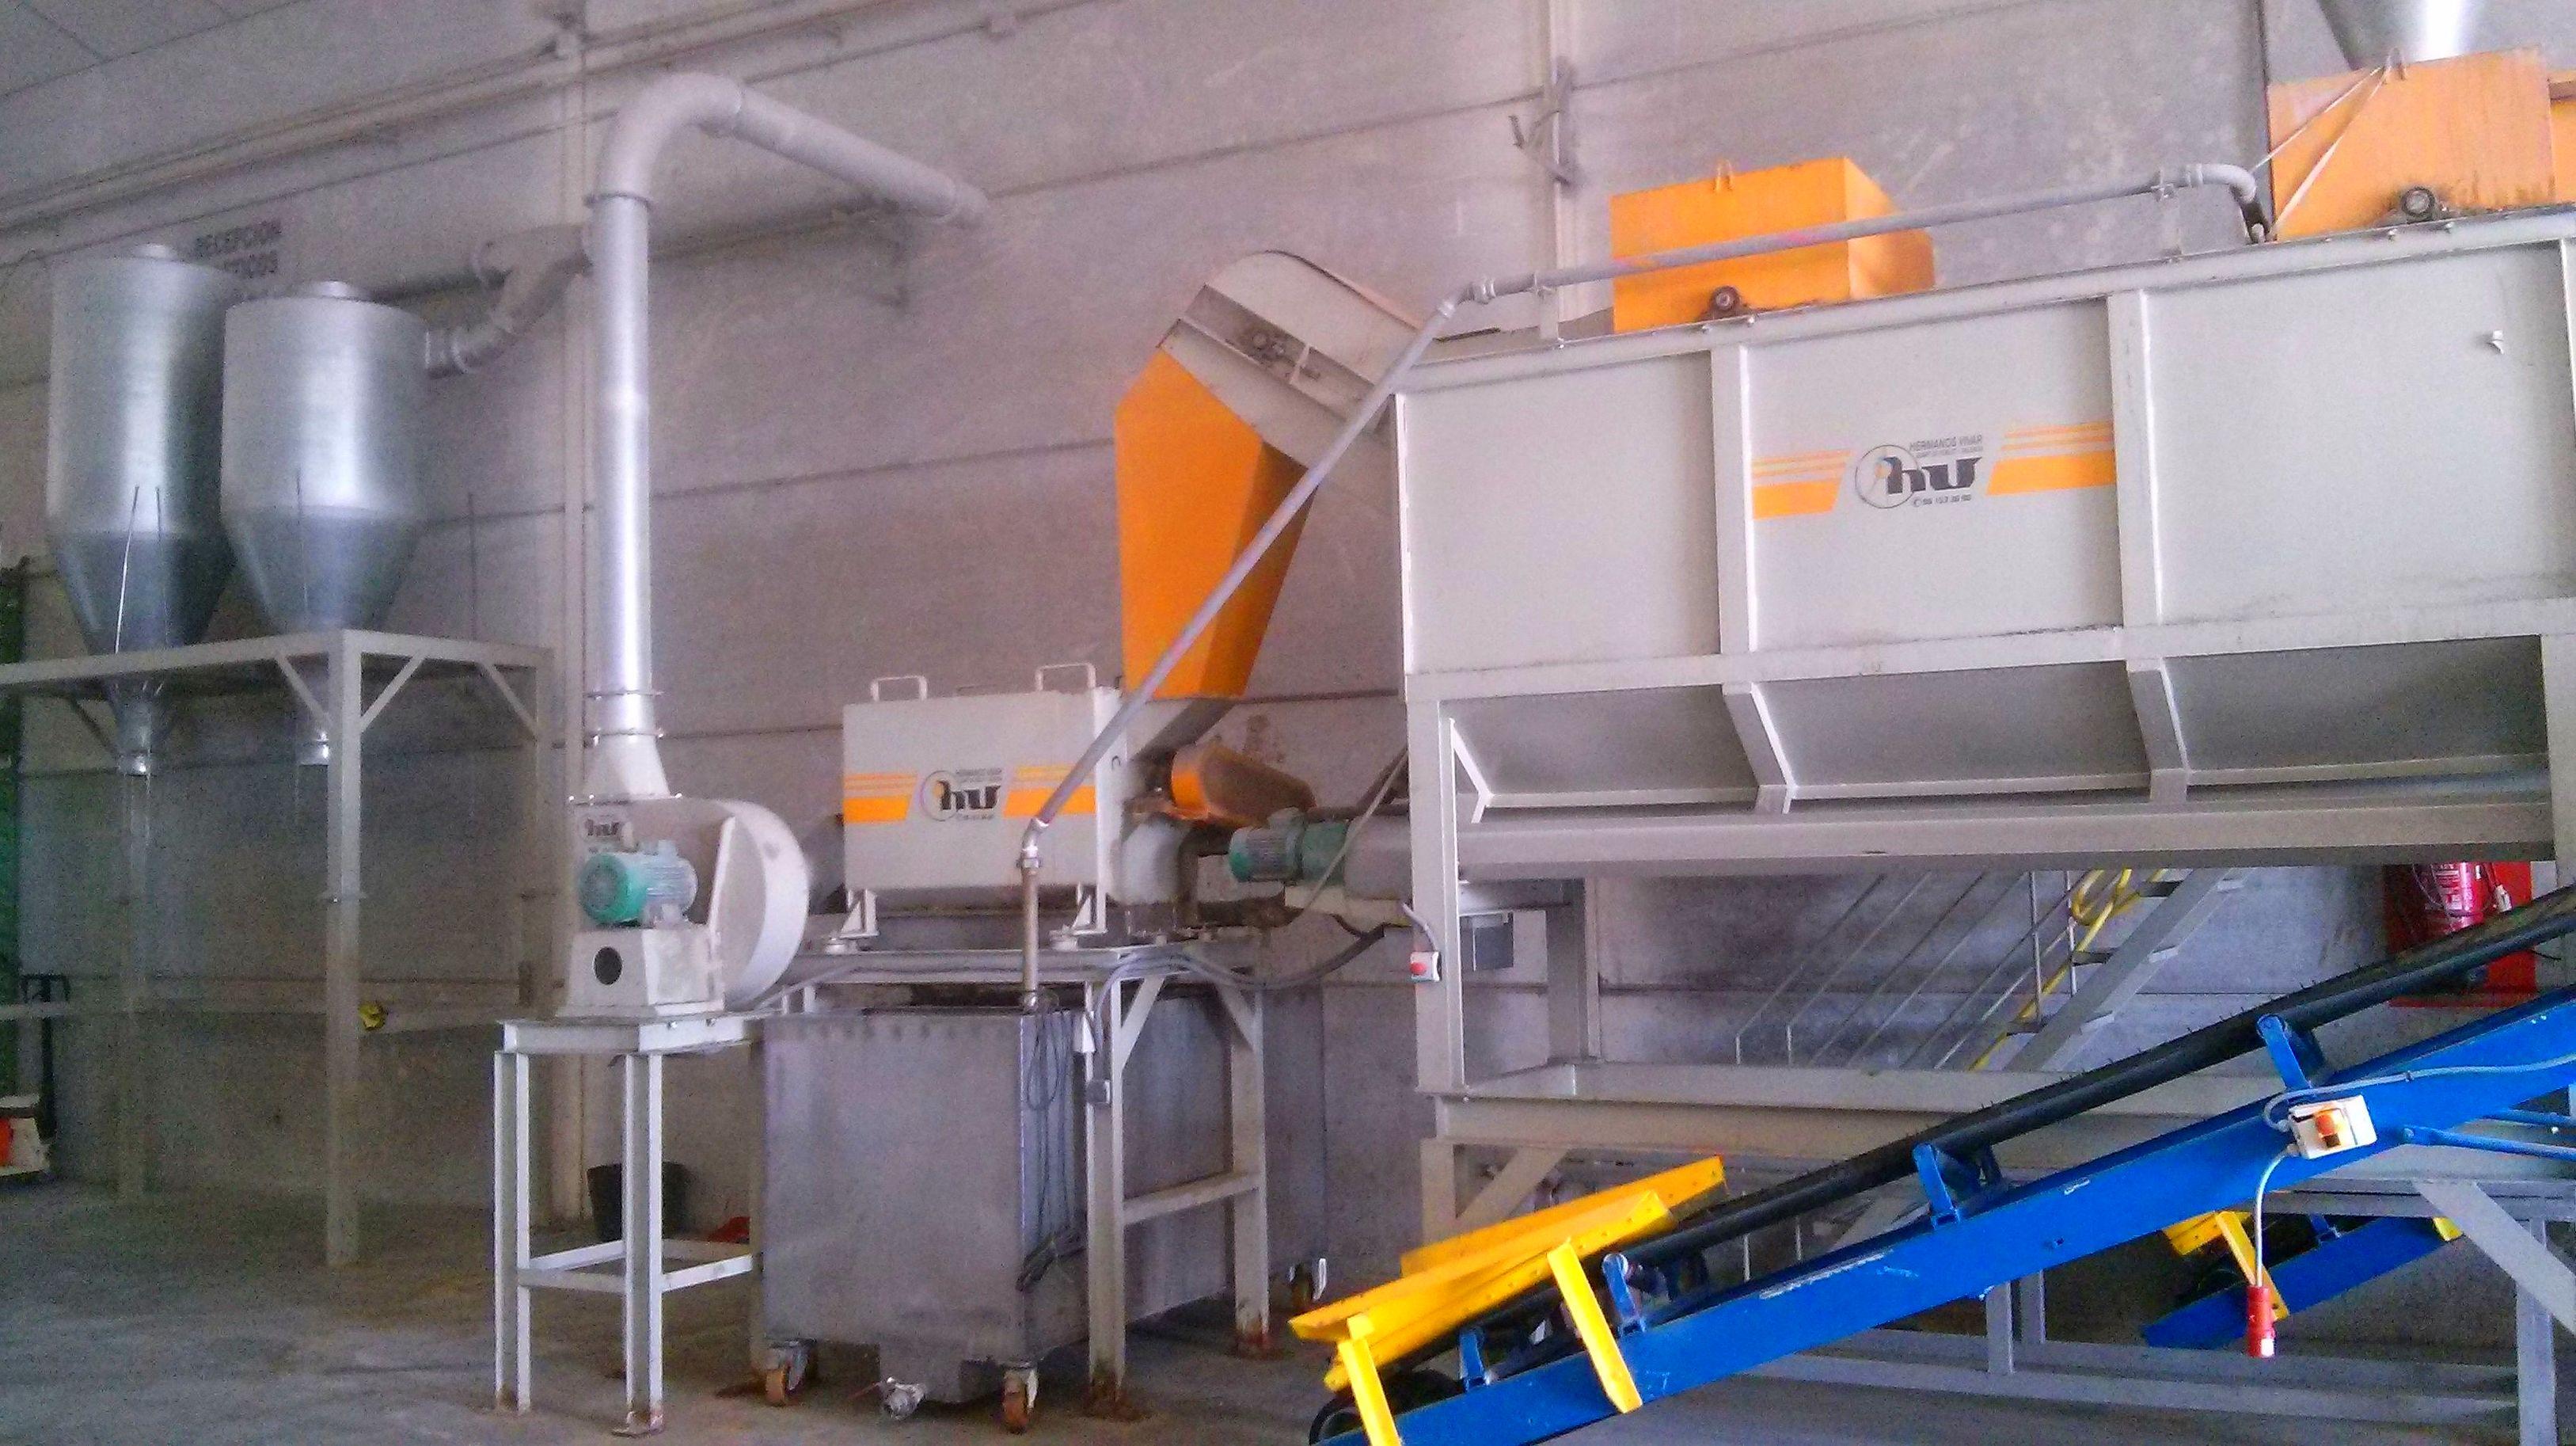 Foto 13 de Reciclaje de residuos en Manises | PalePlast, S. L.